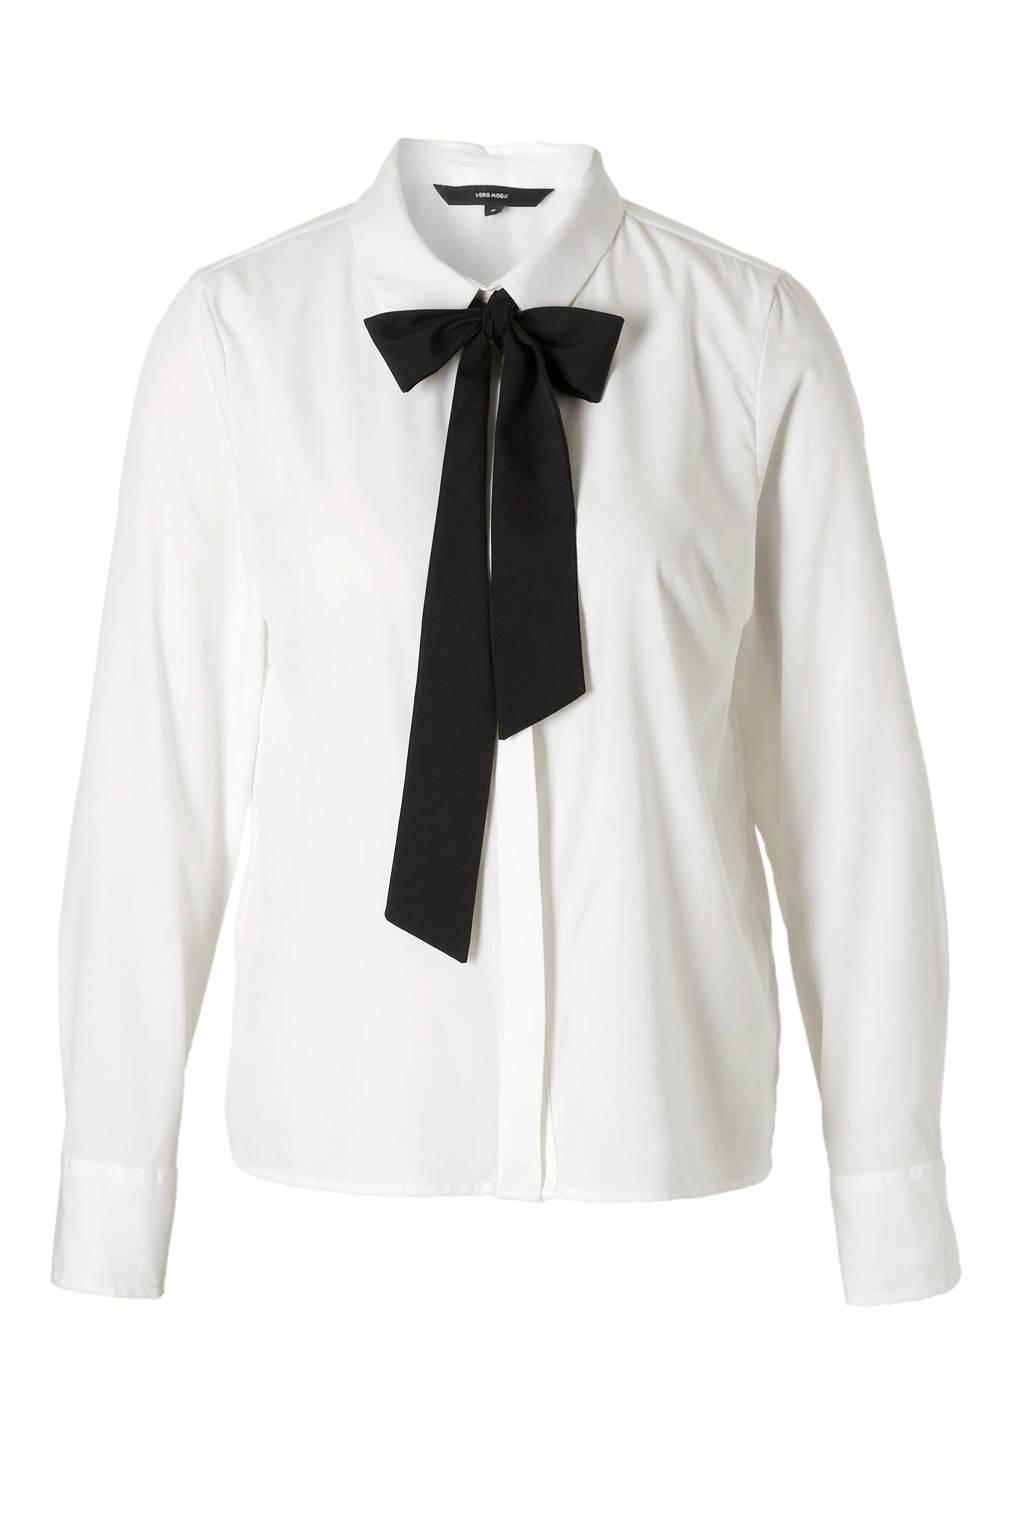 VERO MODA blouse met strik detail, Wit/zwart